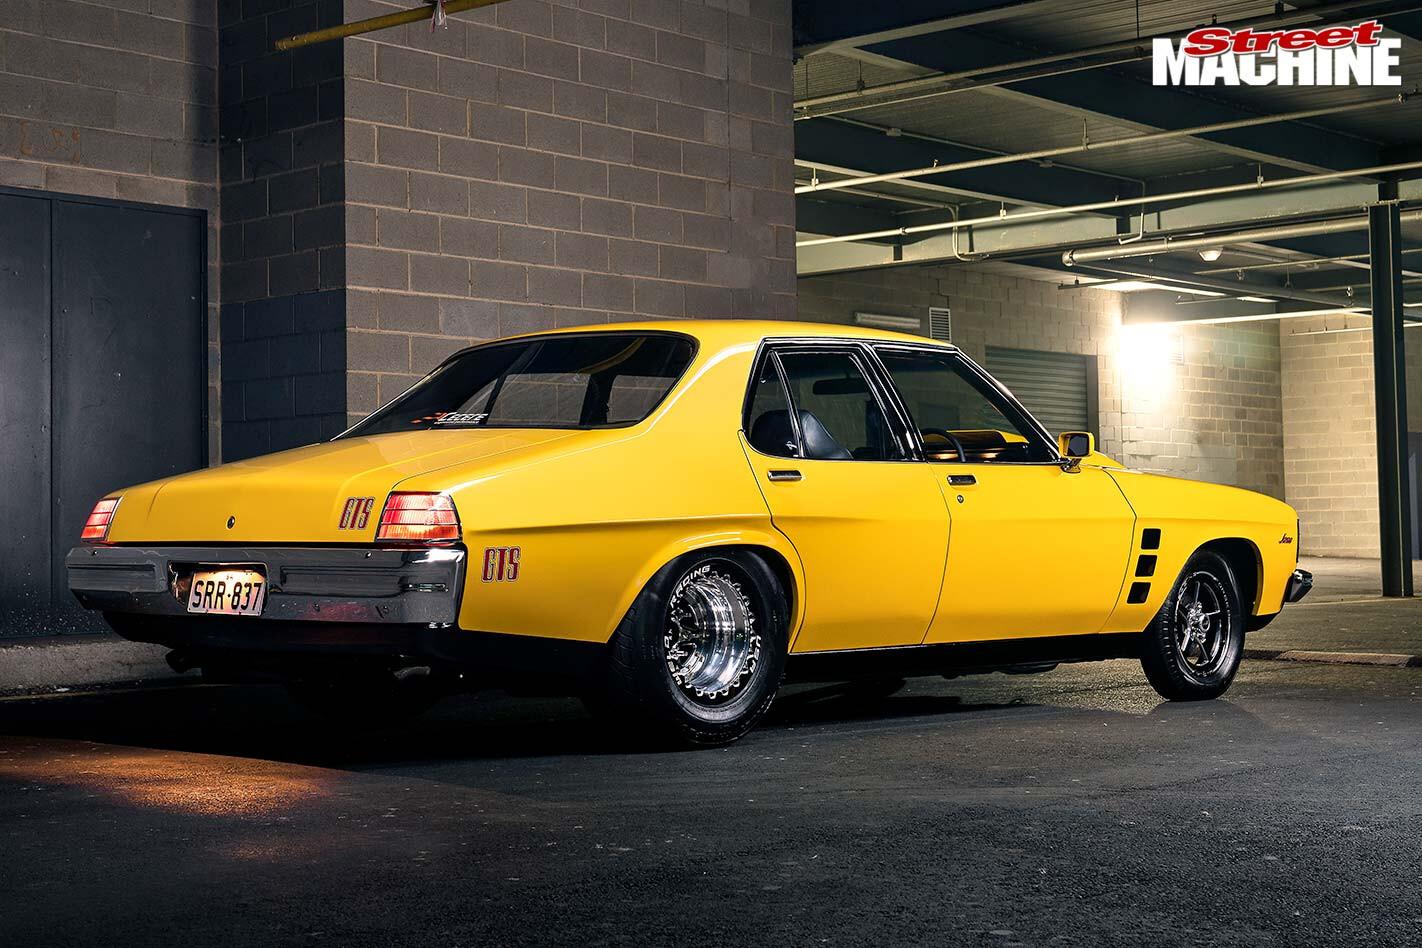 Holden HJ GTS rear